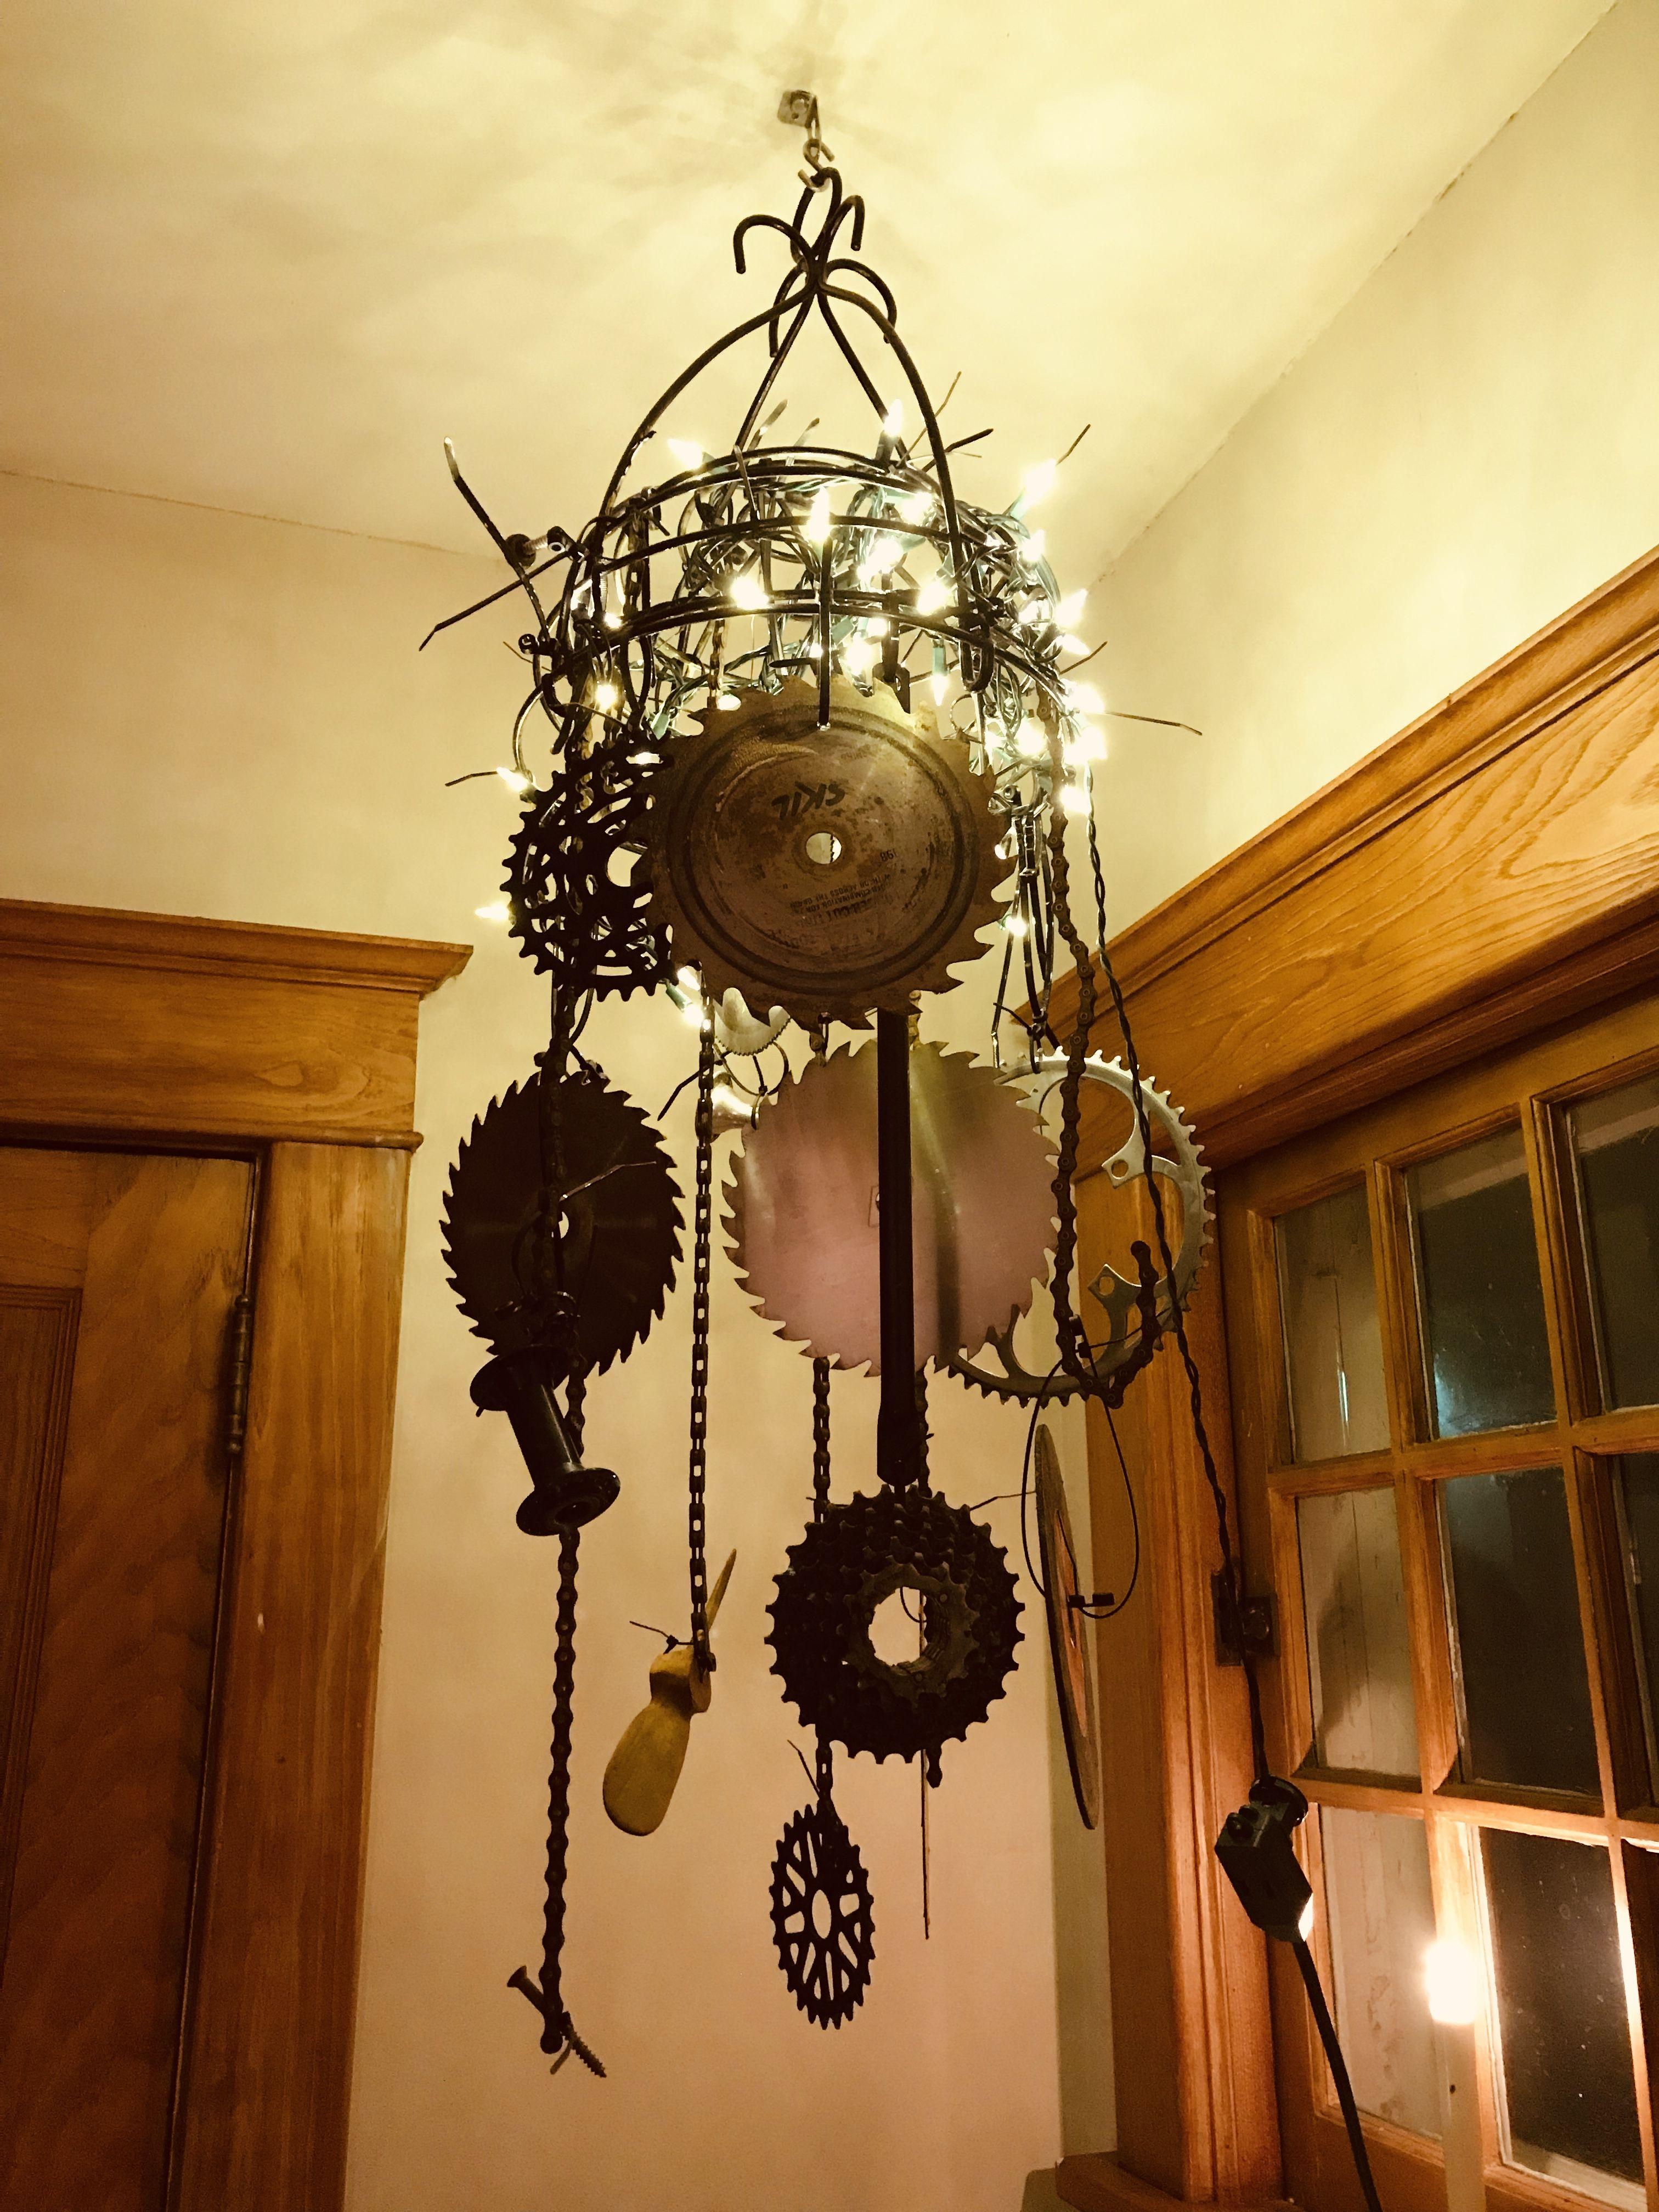 Hardware Chandelier Upside Down Hanging Basket Saw Blades Bike Parts Zip Ties Easy But Heavy Chandelier Ceiling Lights Hanging